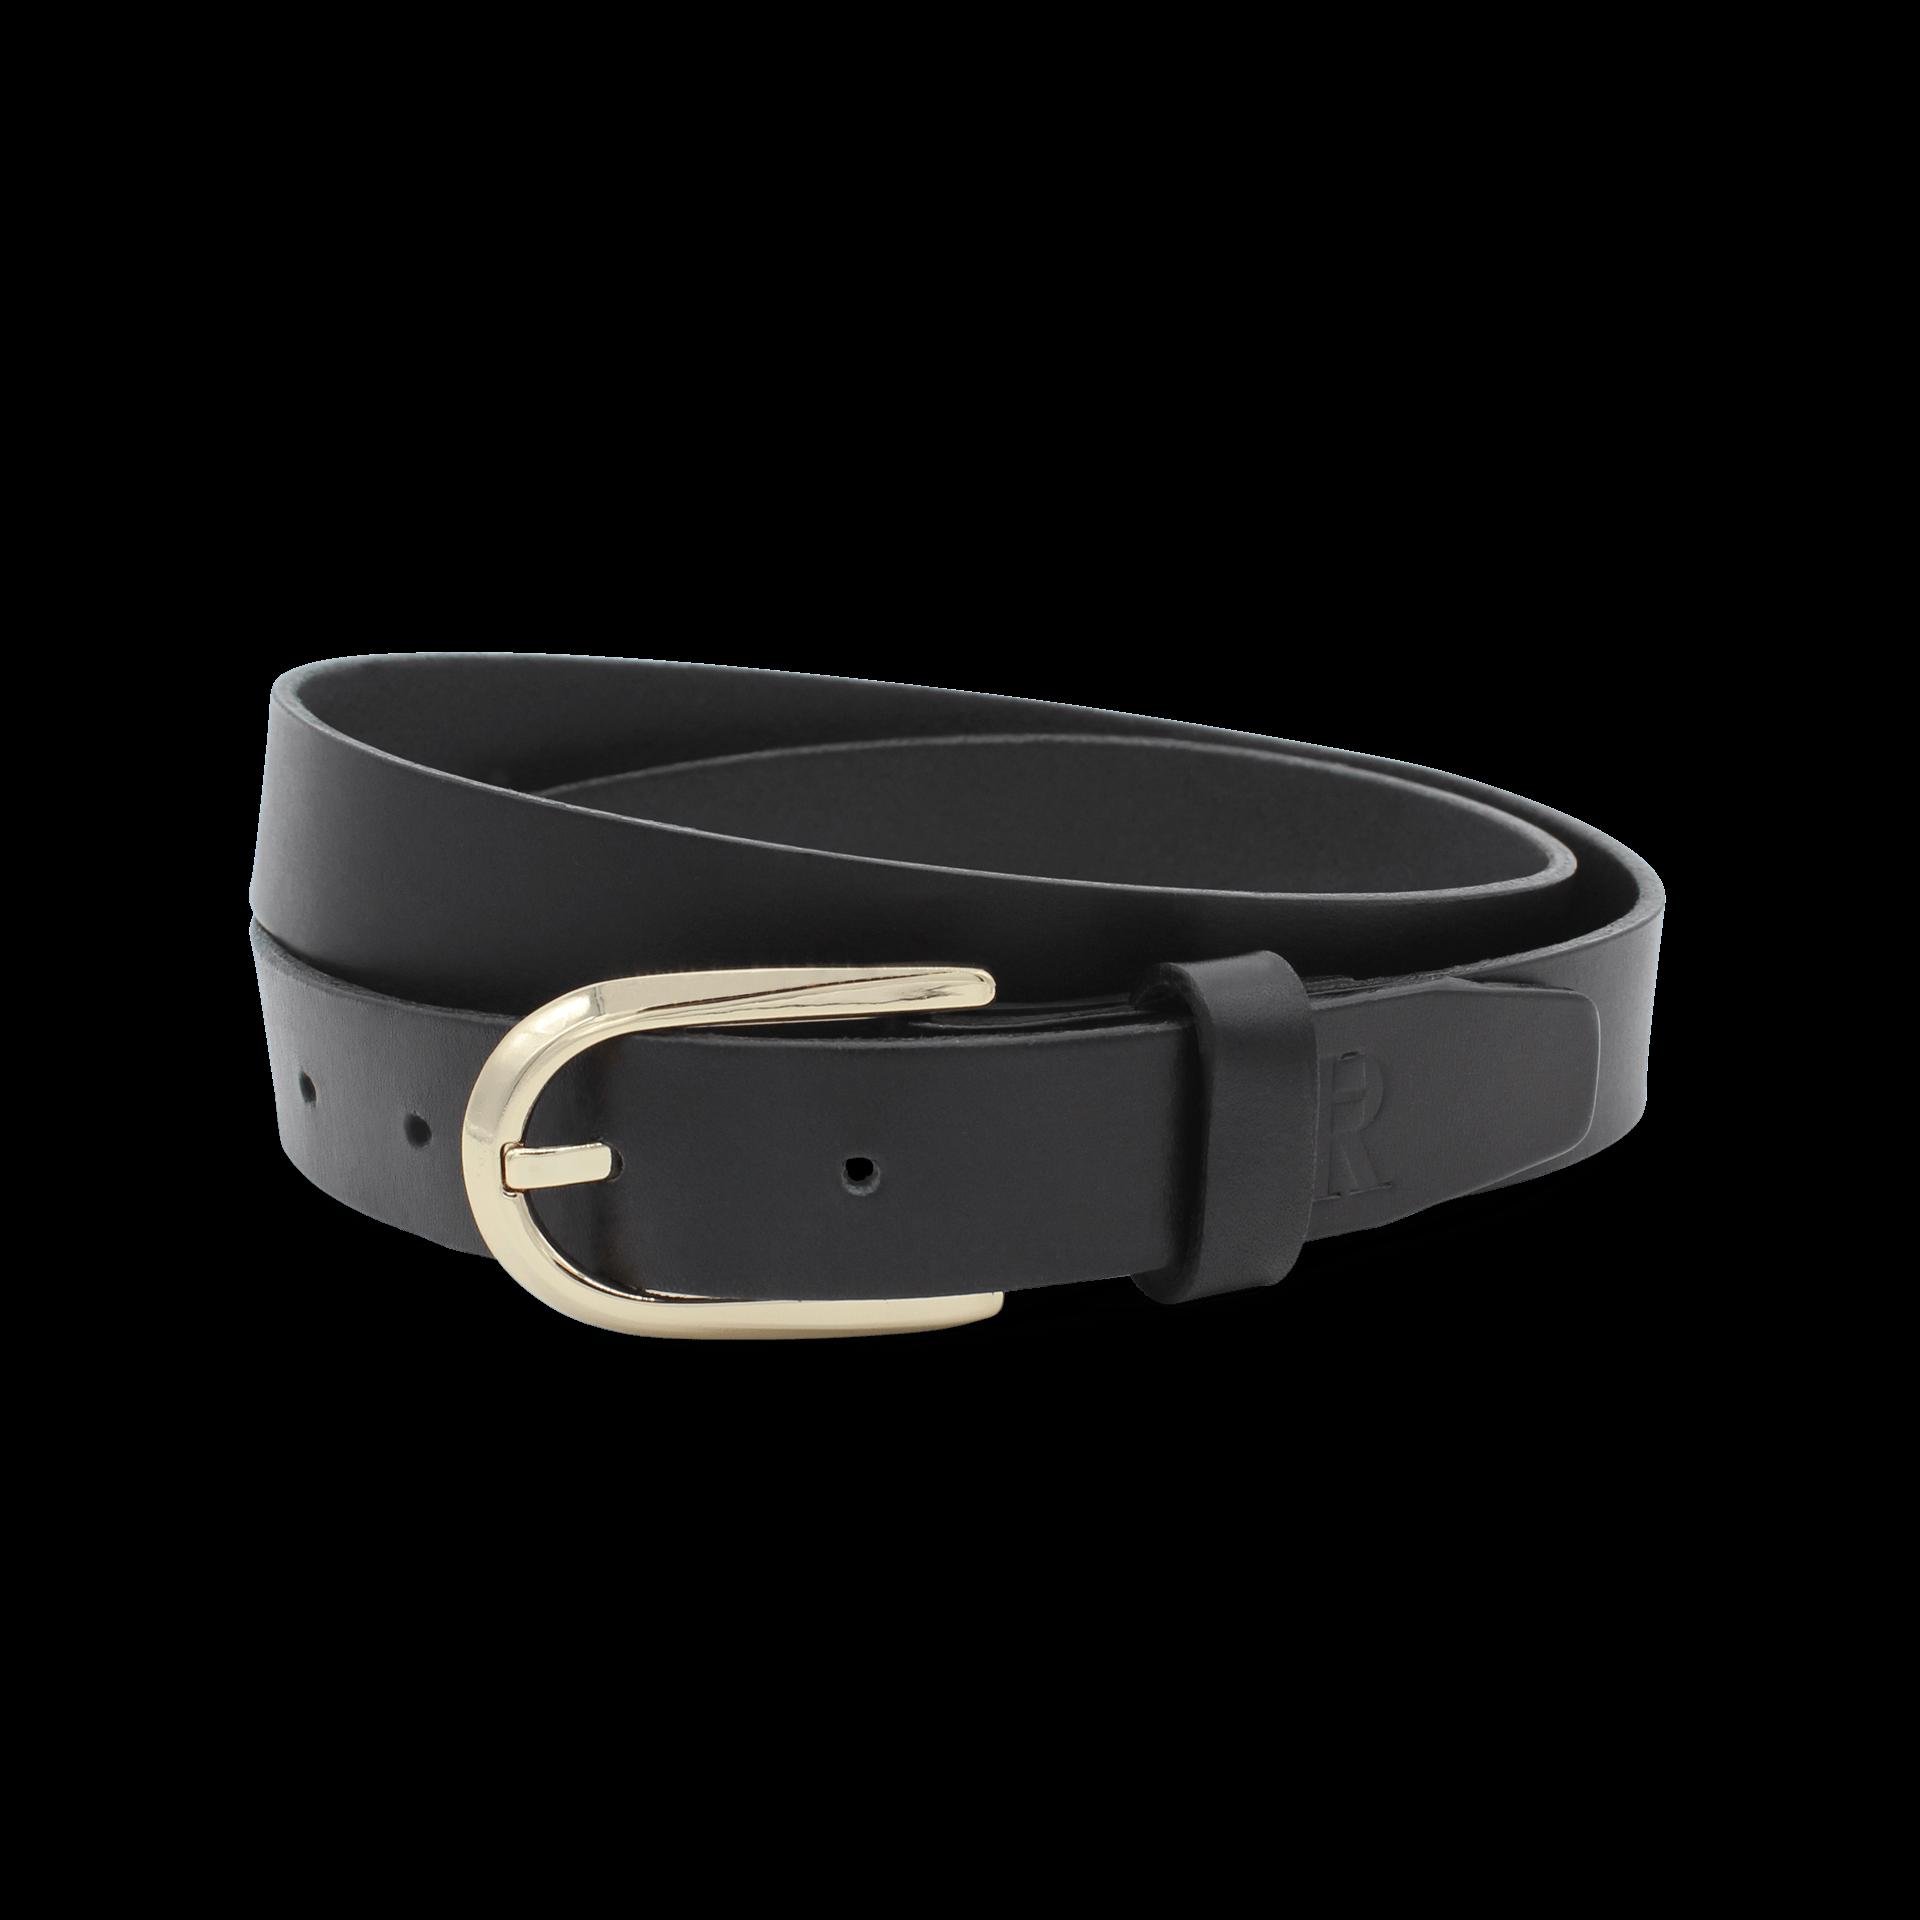 Ledergürtel Damen schmaler schwarzer Damengürtel mit goldener Schnalle Gürtel Schwarz 2,5 cm Lisbeth